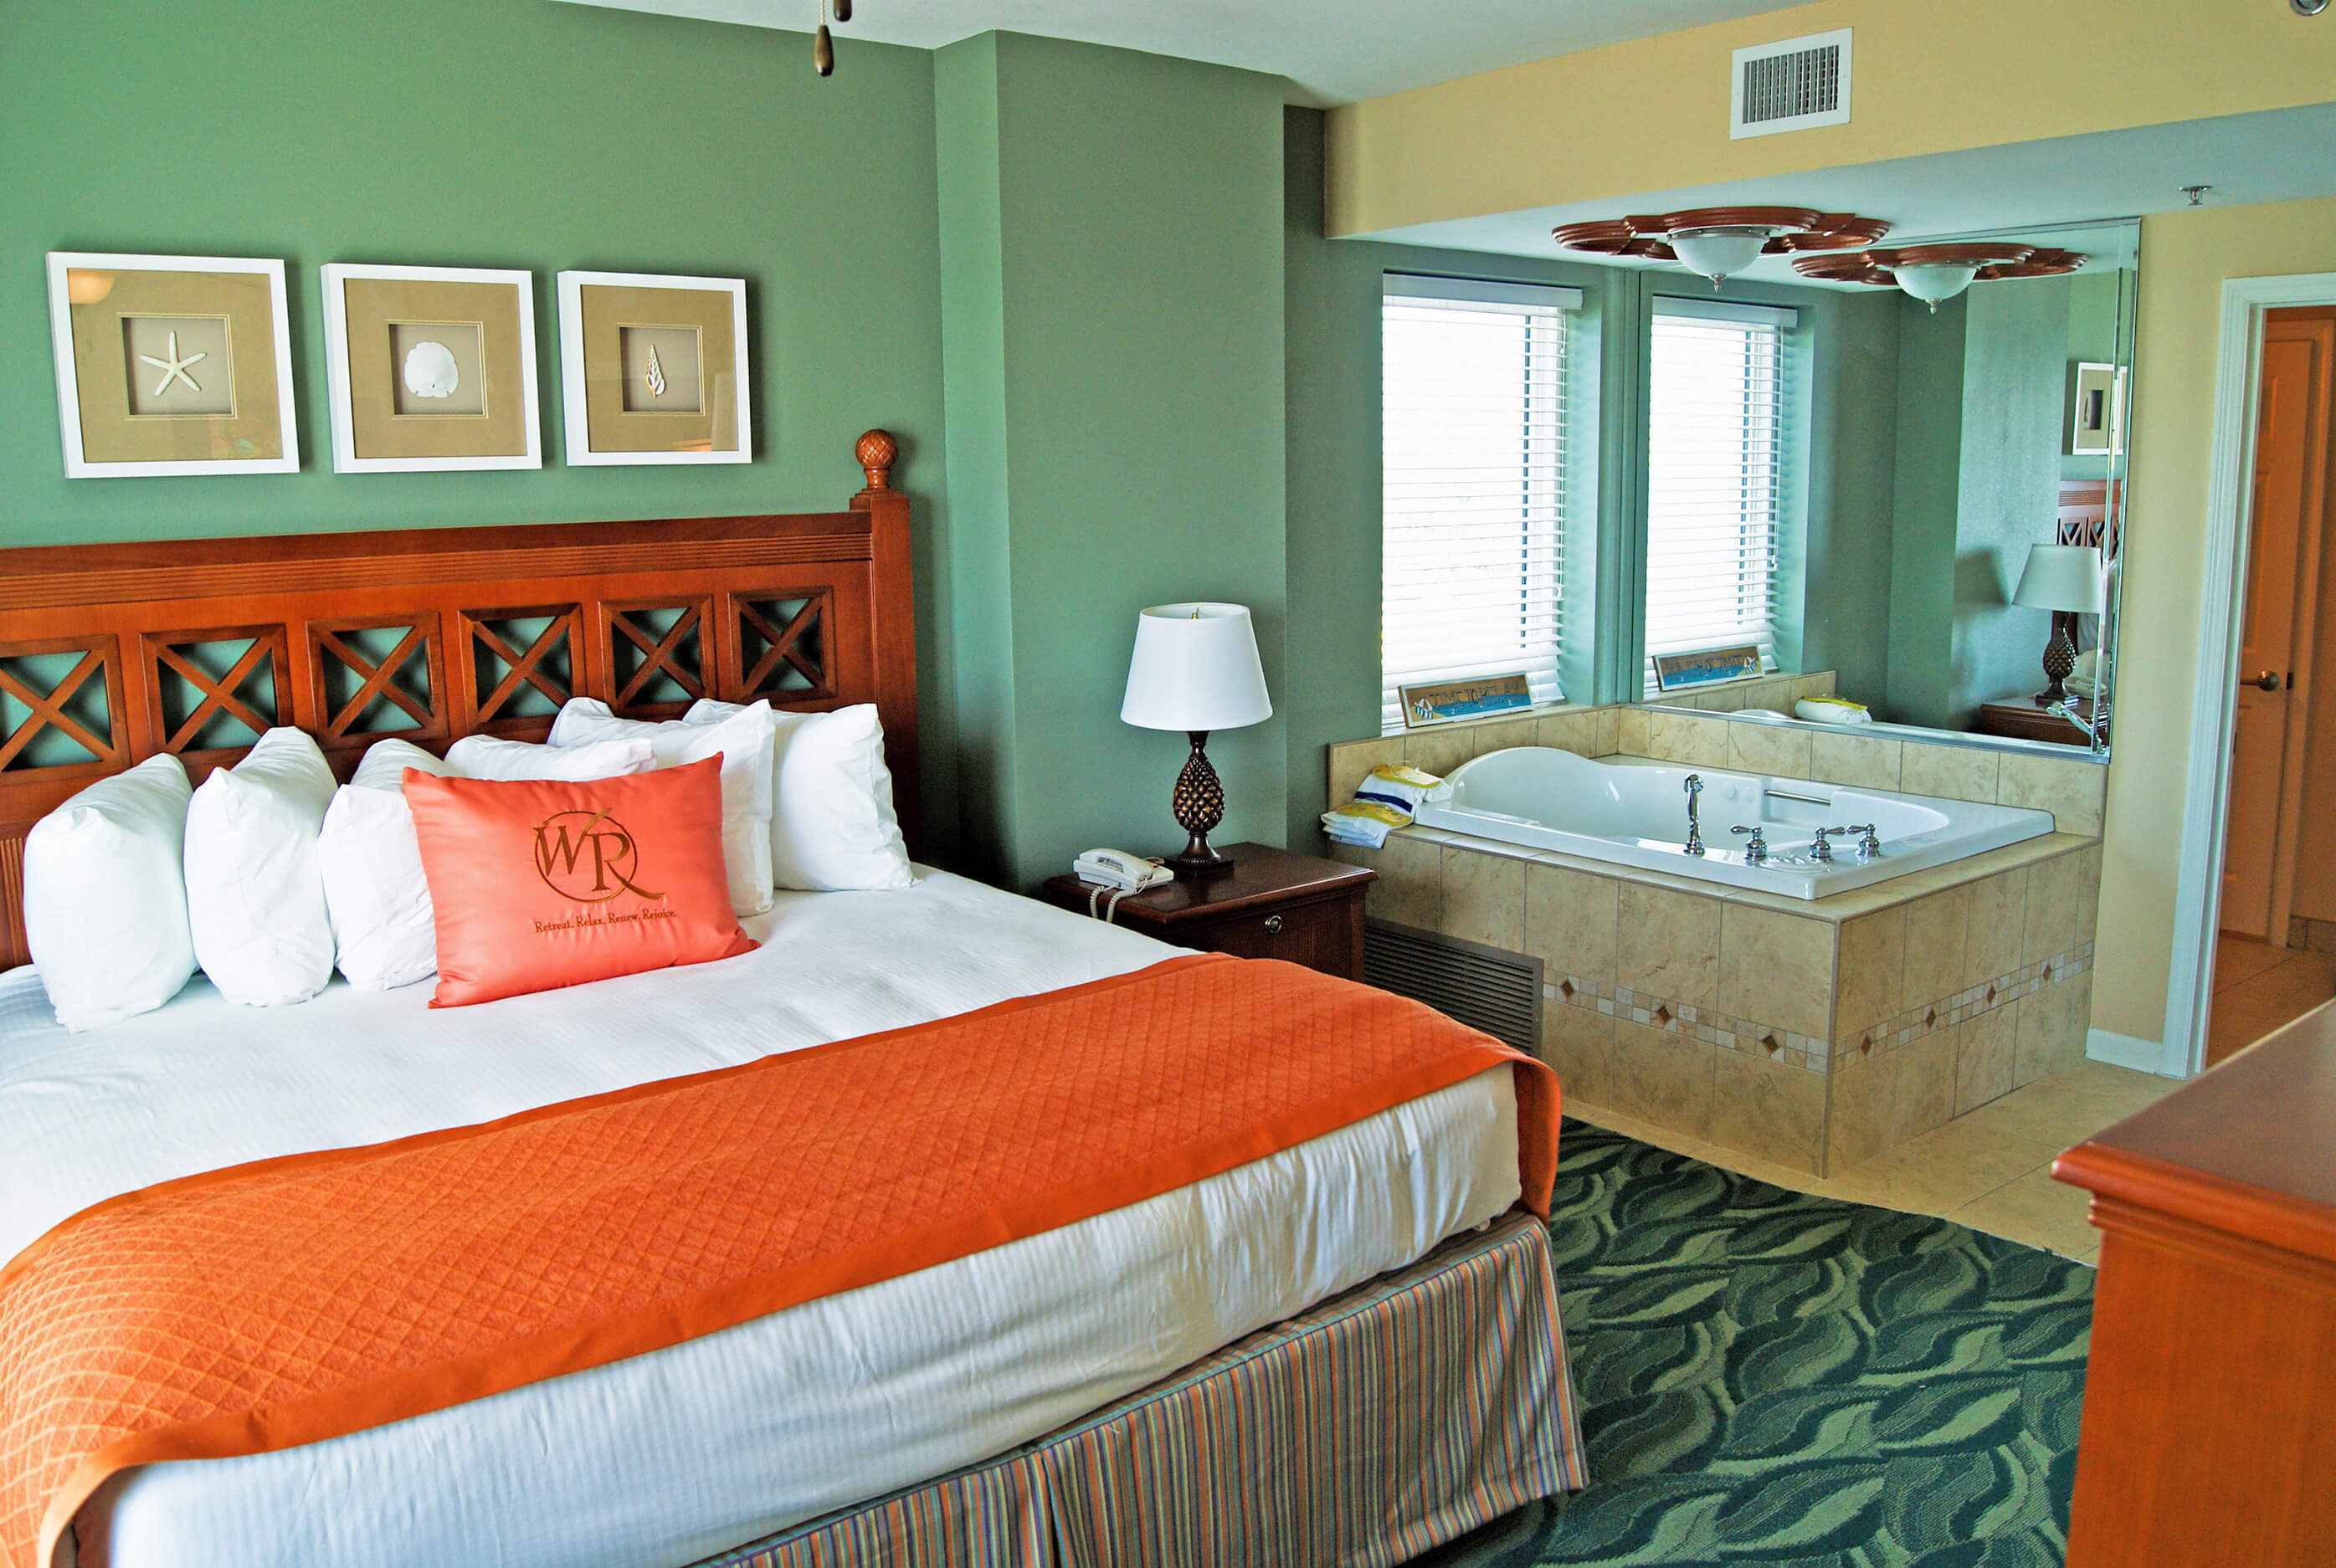 hotels in myrtle beach sc  westgate myrtle beach accommodations, Bedroom designs